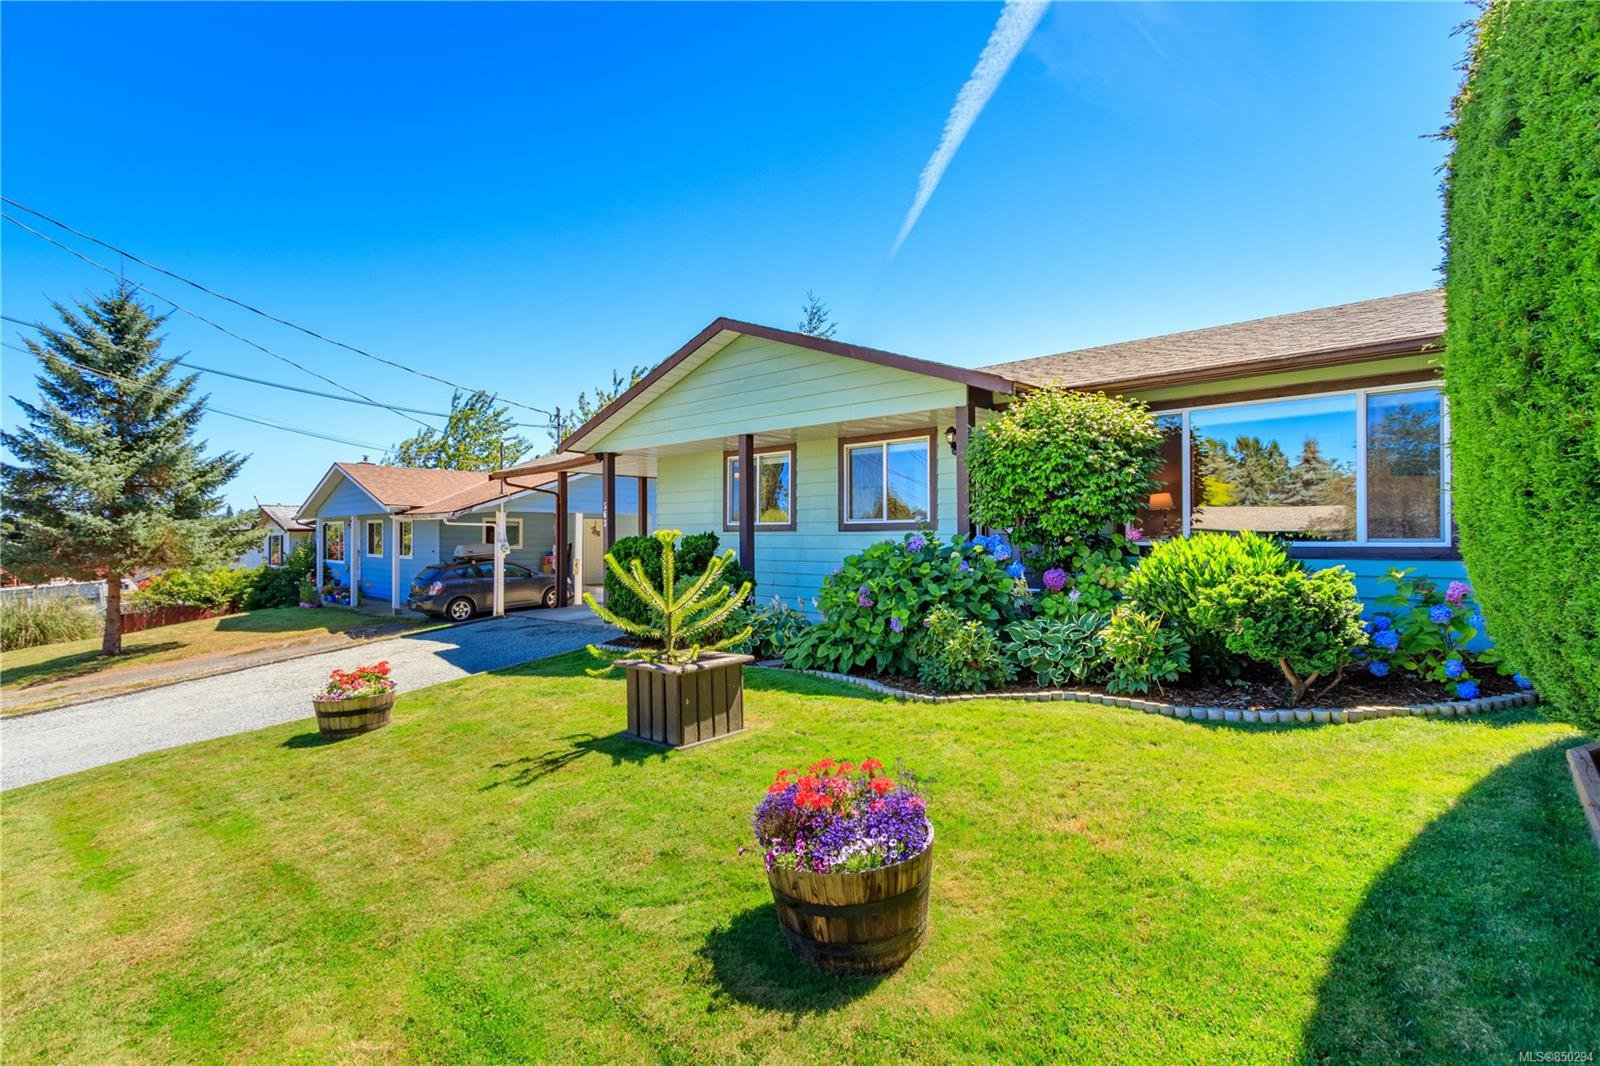 Main Photo: 563 Nova St in : Na South Nanaimo House for sale (Nanaimo)  : MLS®# 850294